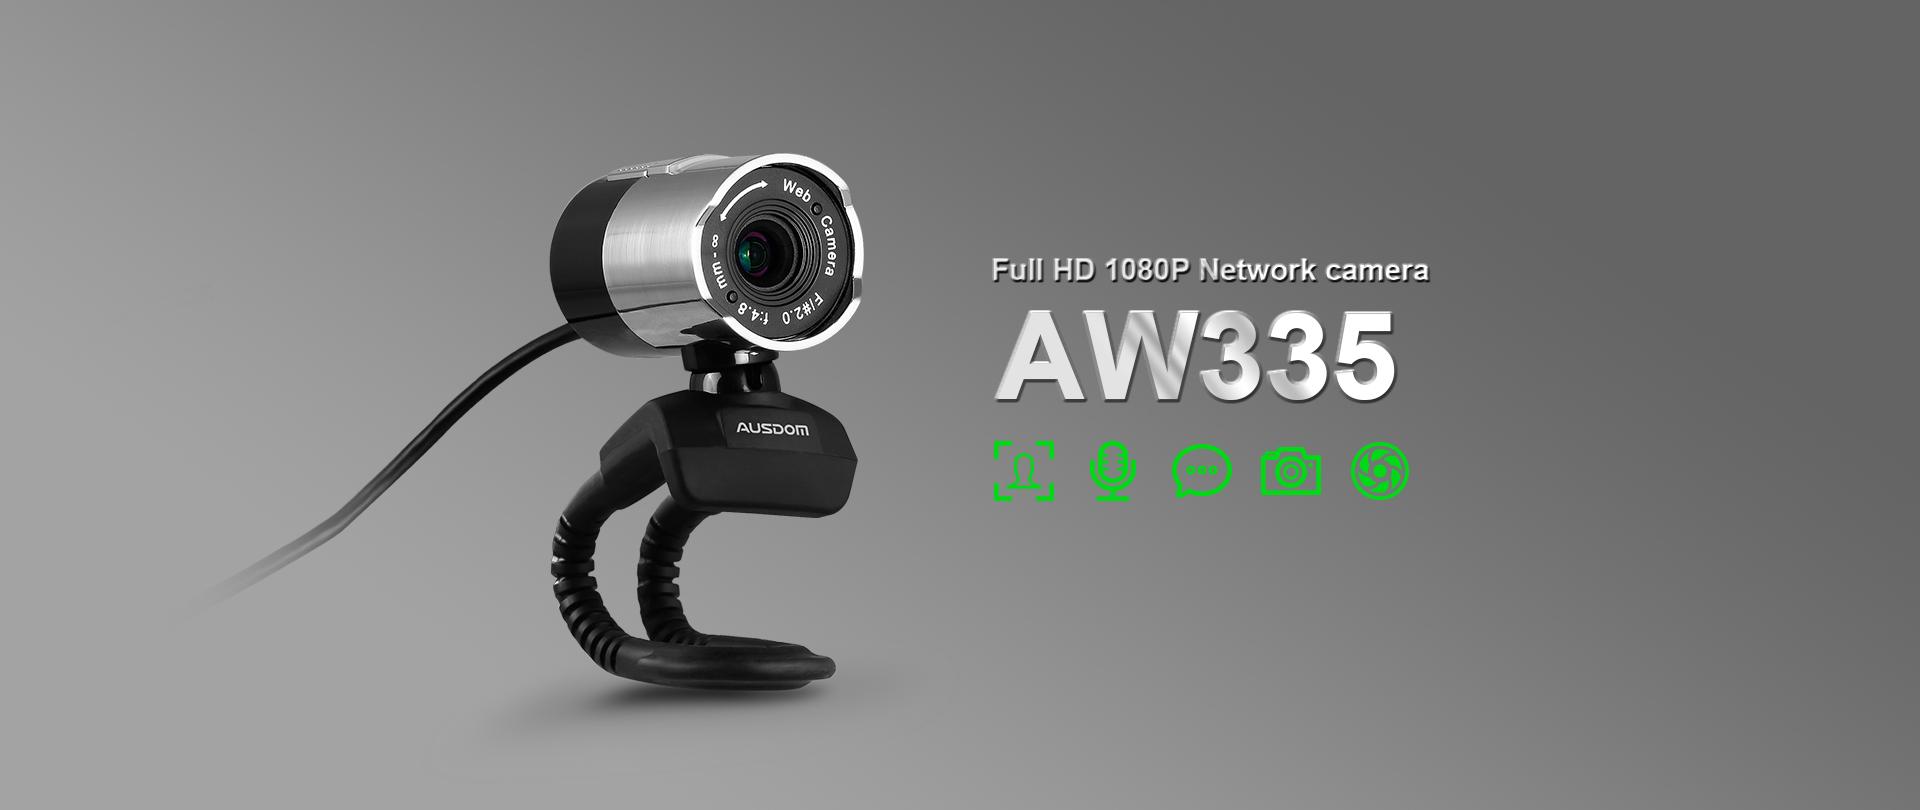 Webcam Ausdom AW335 full HD 1080p, 2mpx - 162533